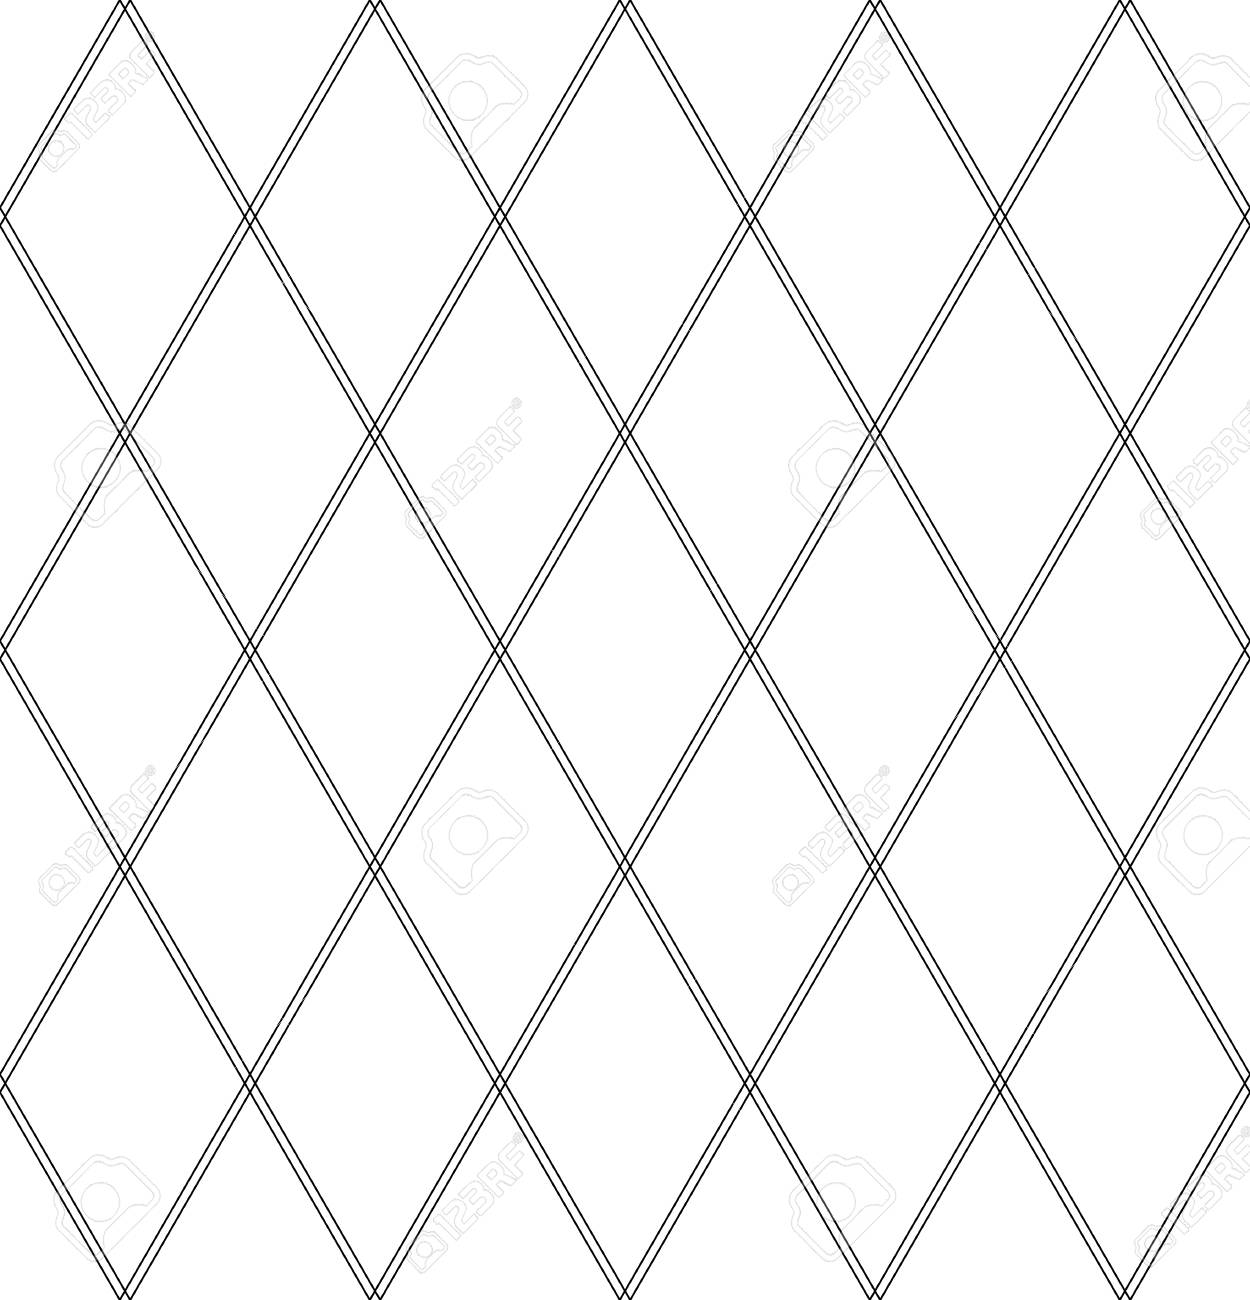 Seamless diamonds pattern  Geometric lattice texture  Vector